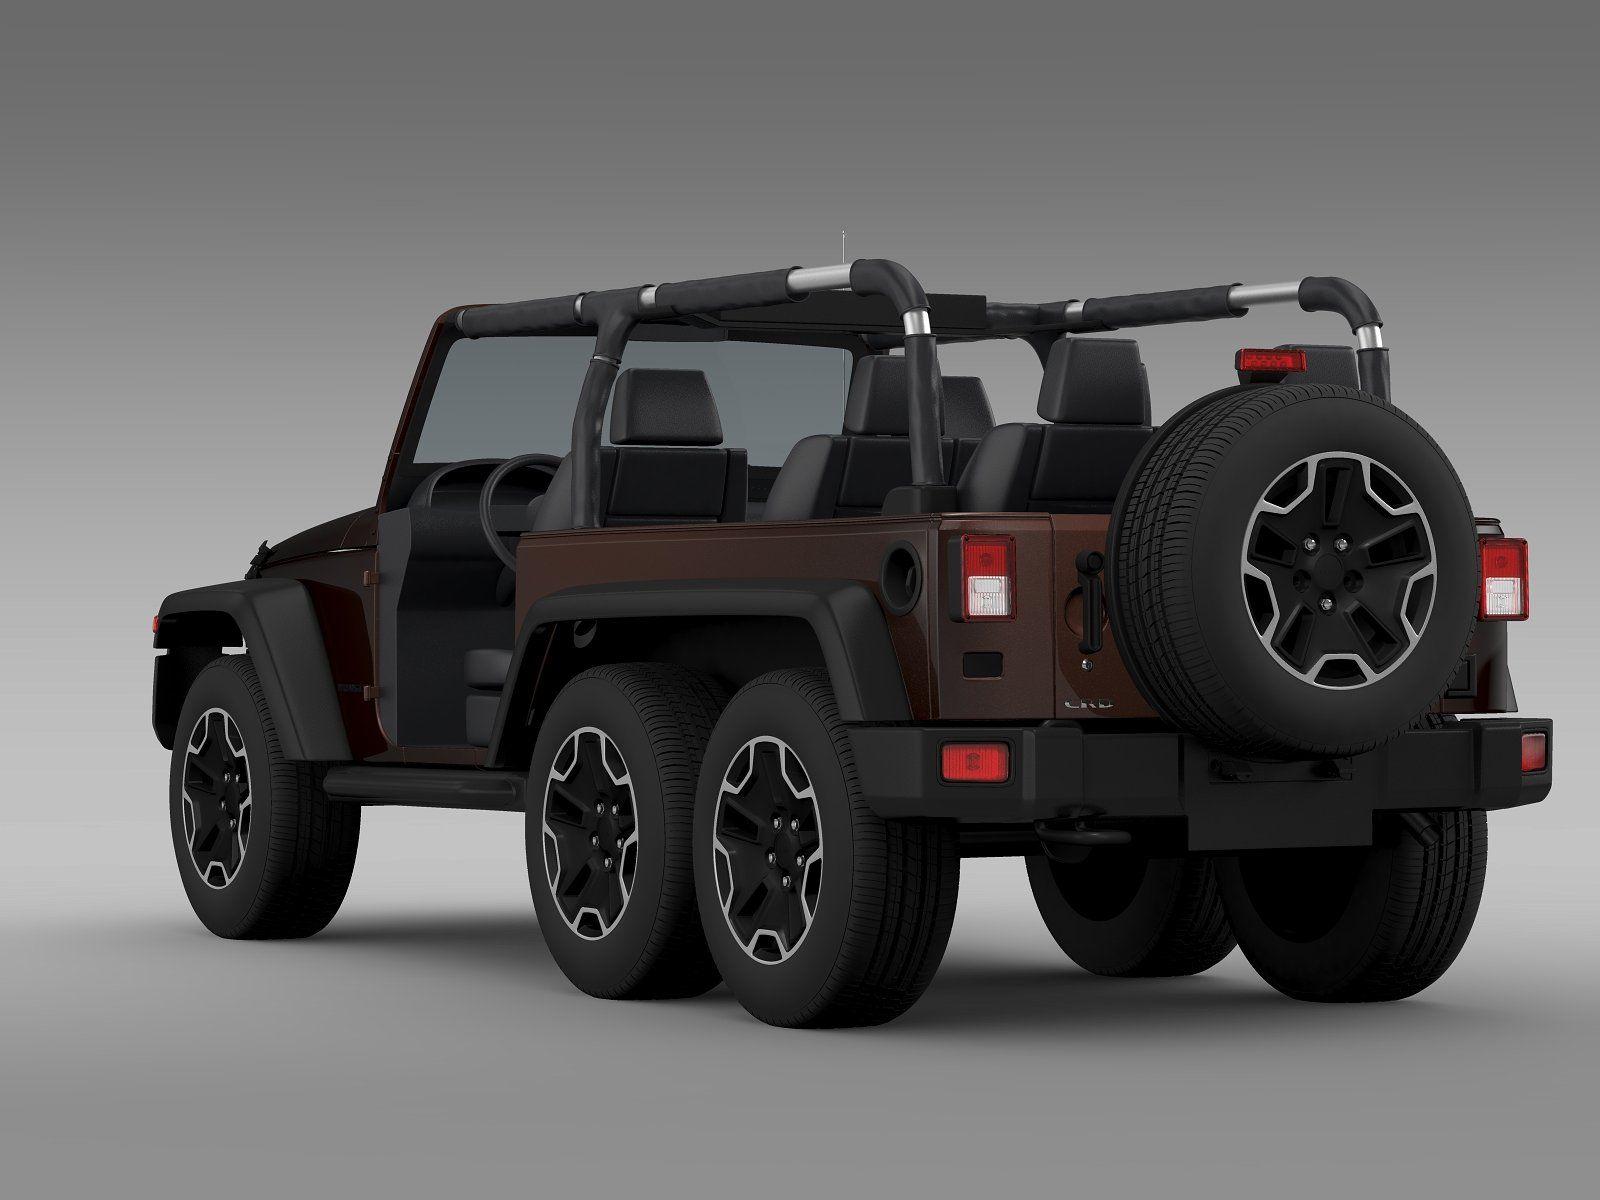 Jeep Wrangler Rubicon 6x6 2016 Jeep Wrangler Rubicon Wrangler Rubicon Jeep Rubicon